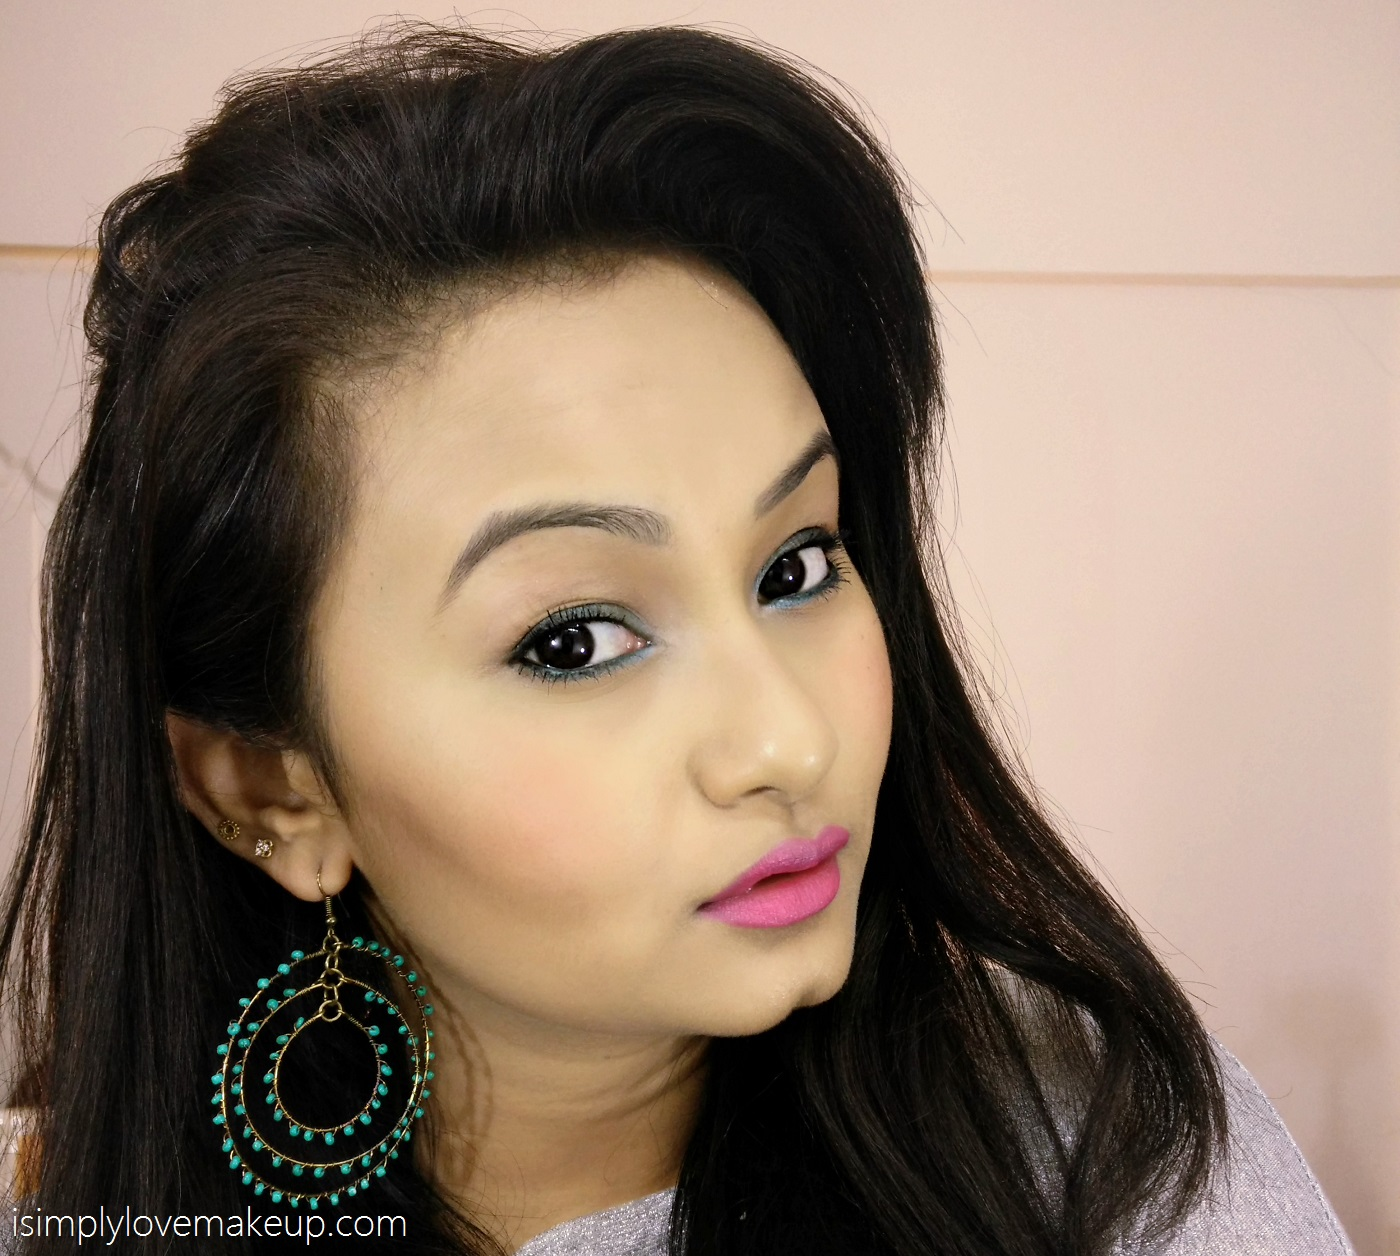 Maybelline Colorsensational Bold Matte Lipstick in MAT1 Samyukta